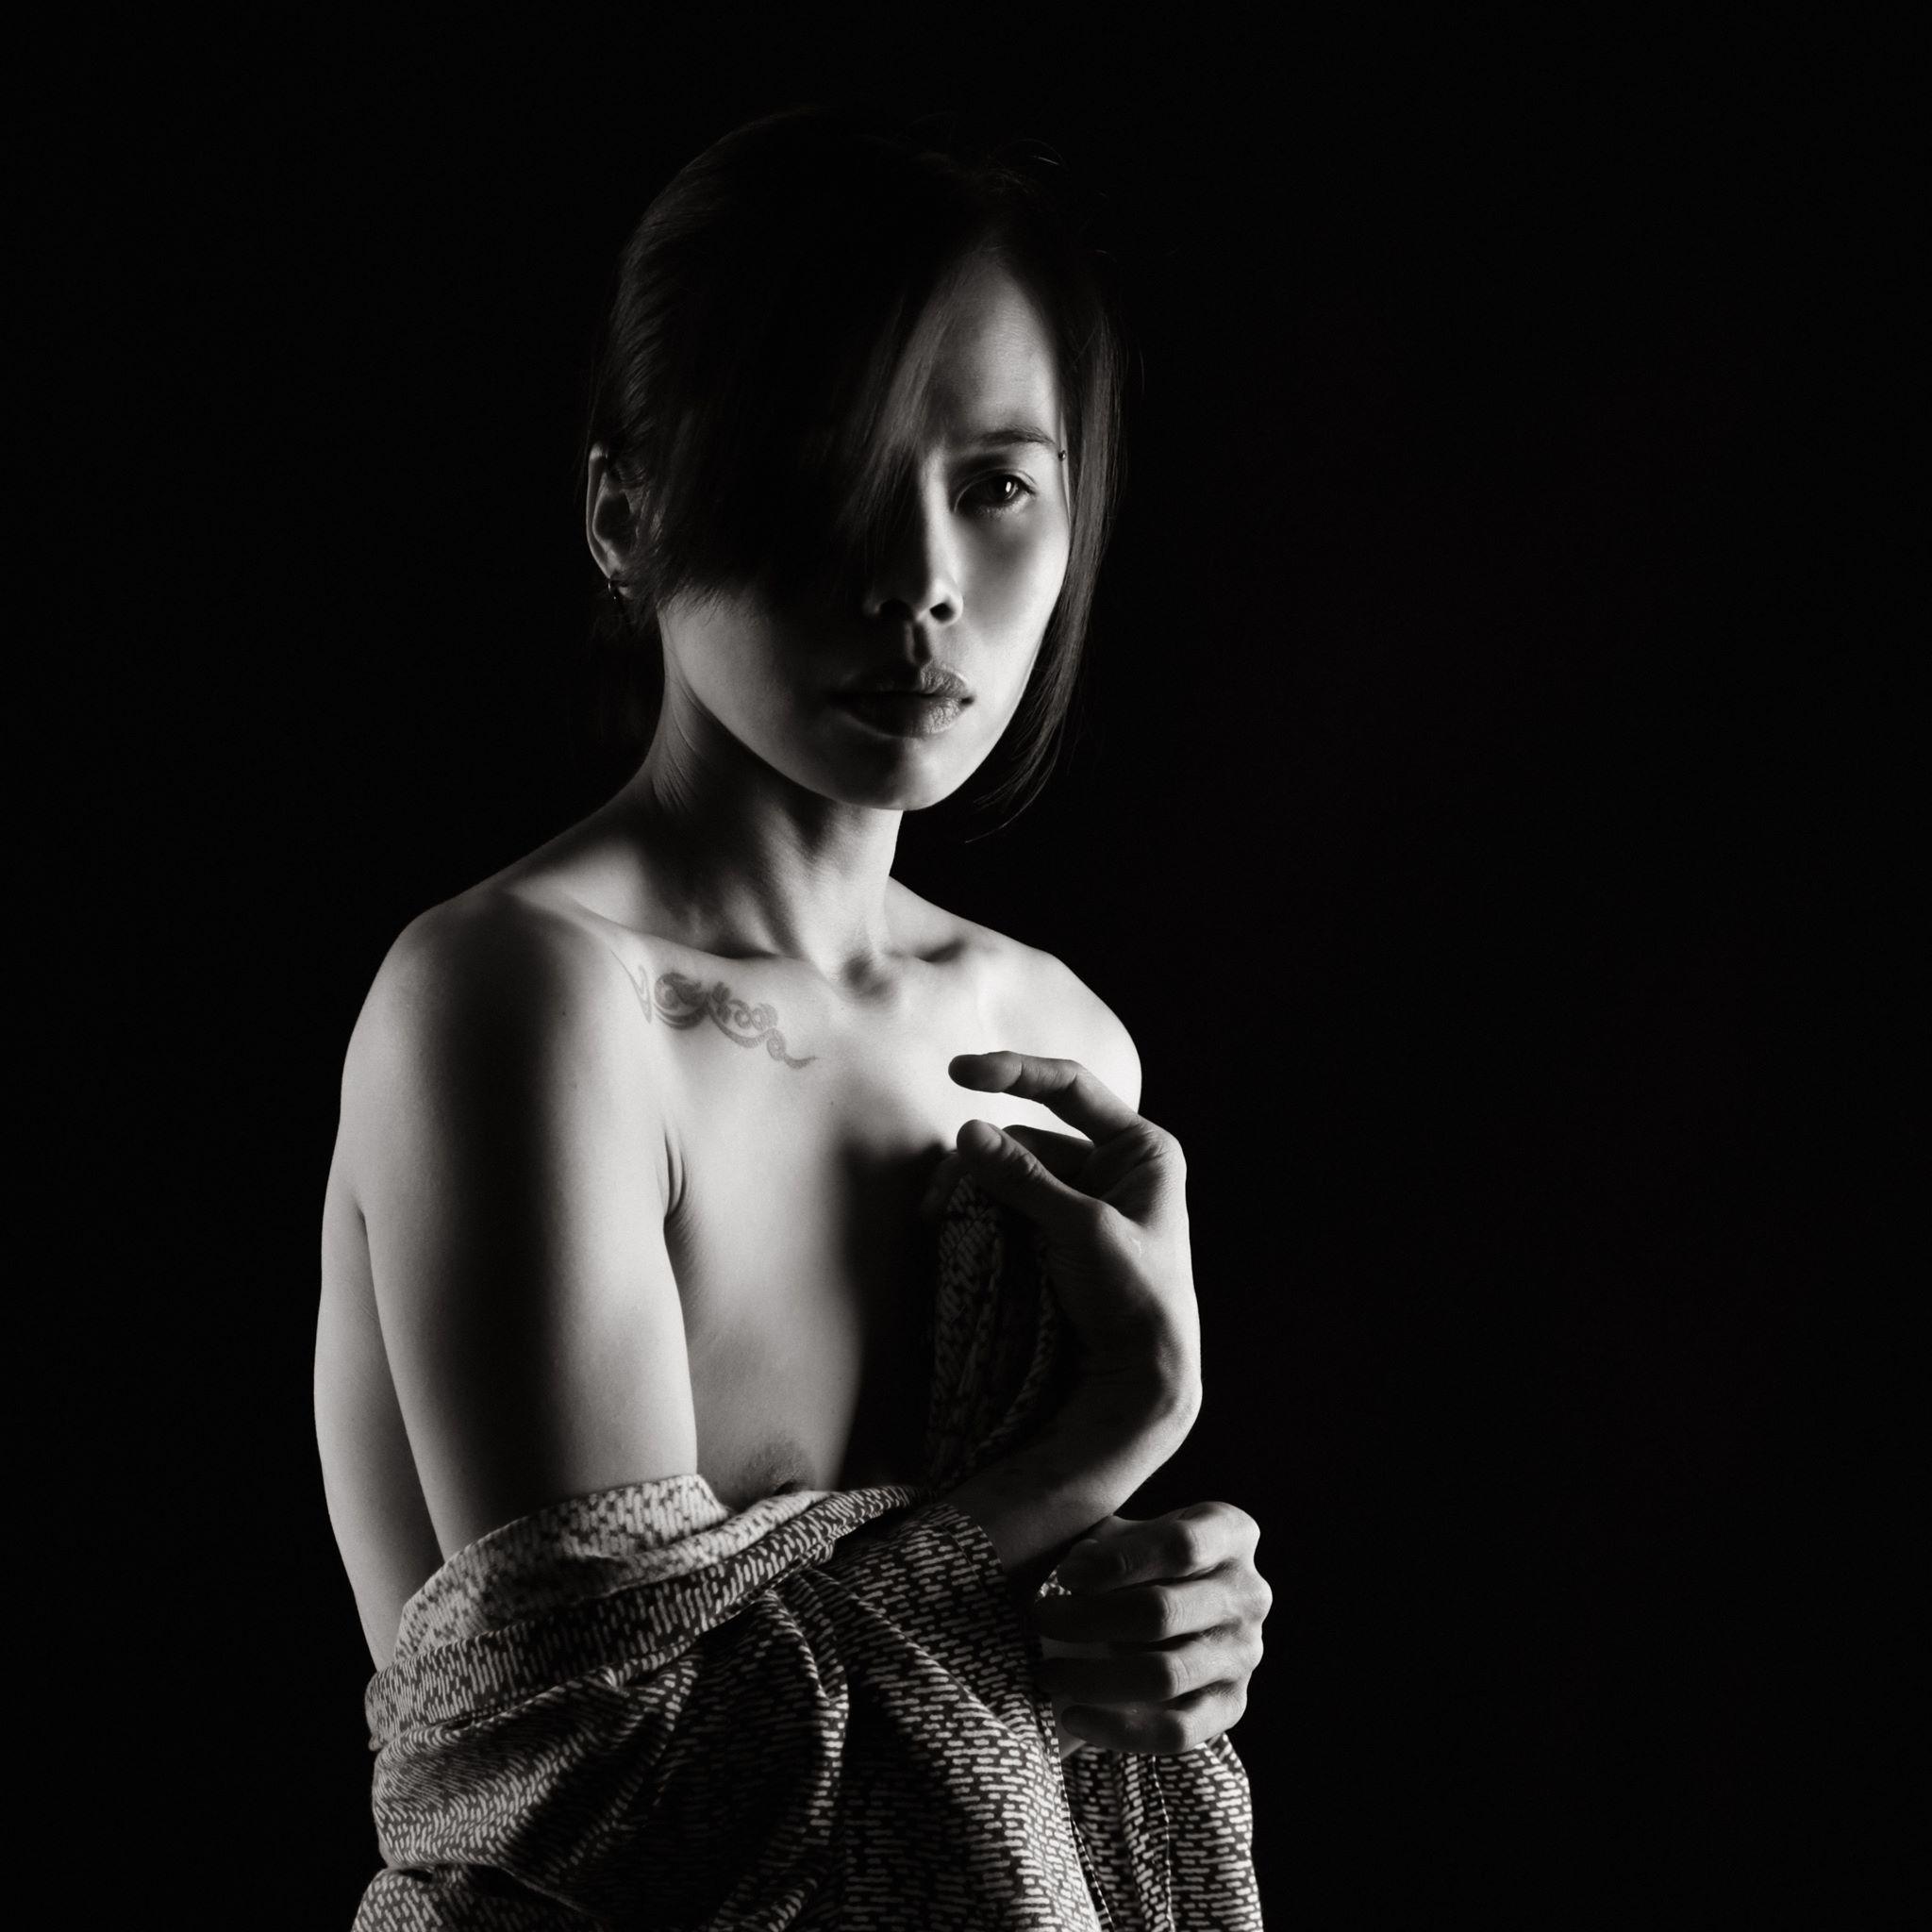 Suelynee ho's model work Photo by Patrice body art